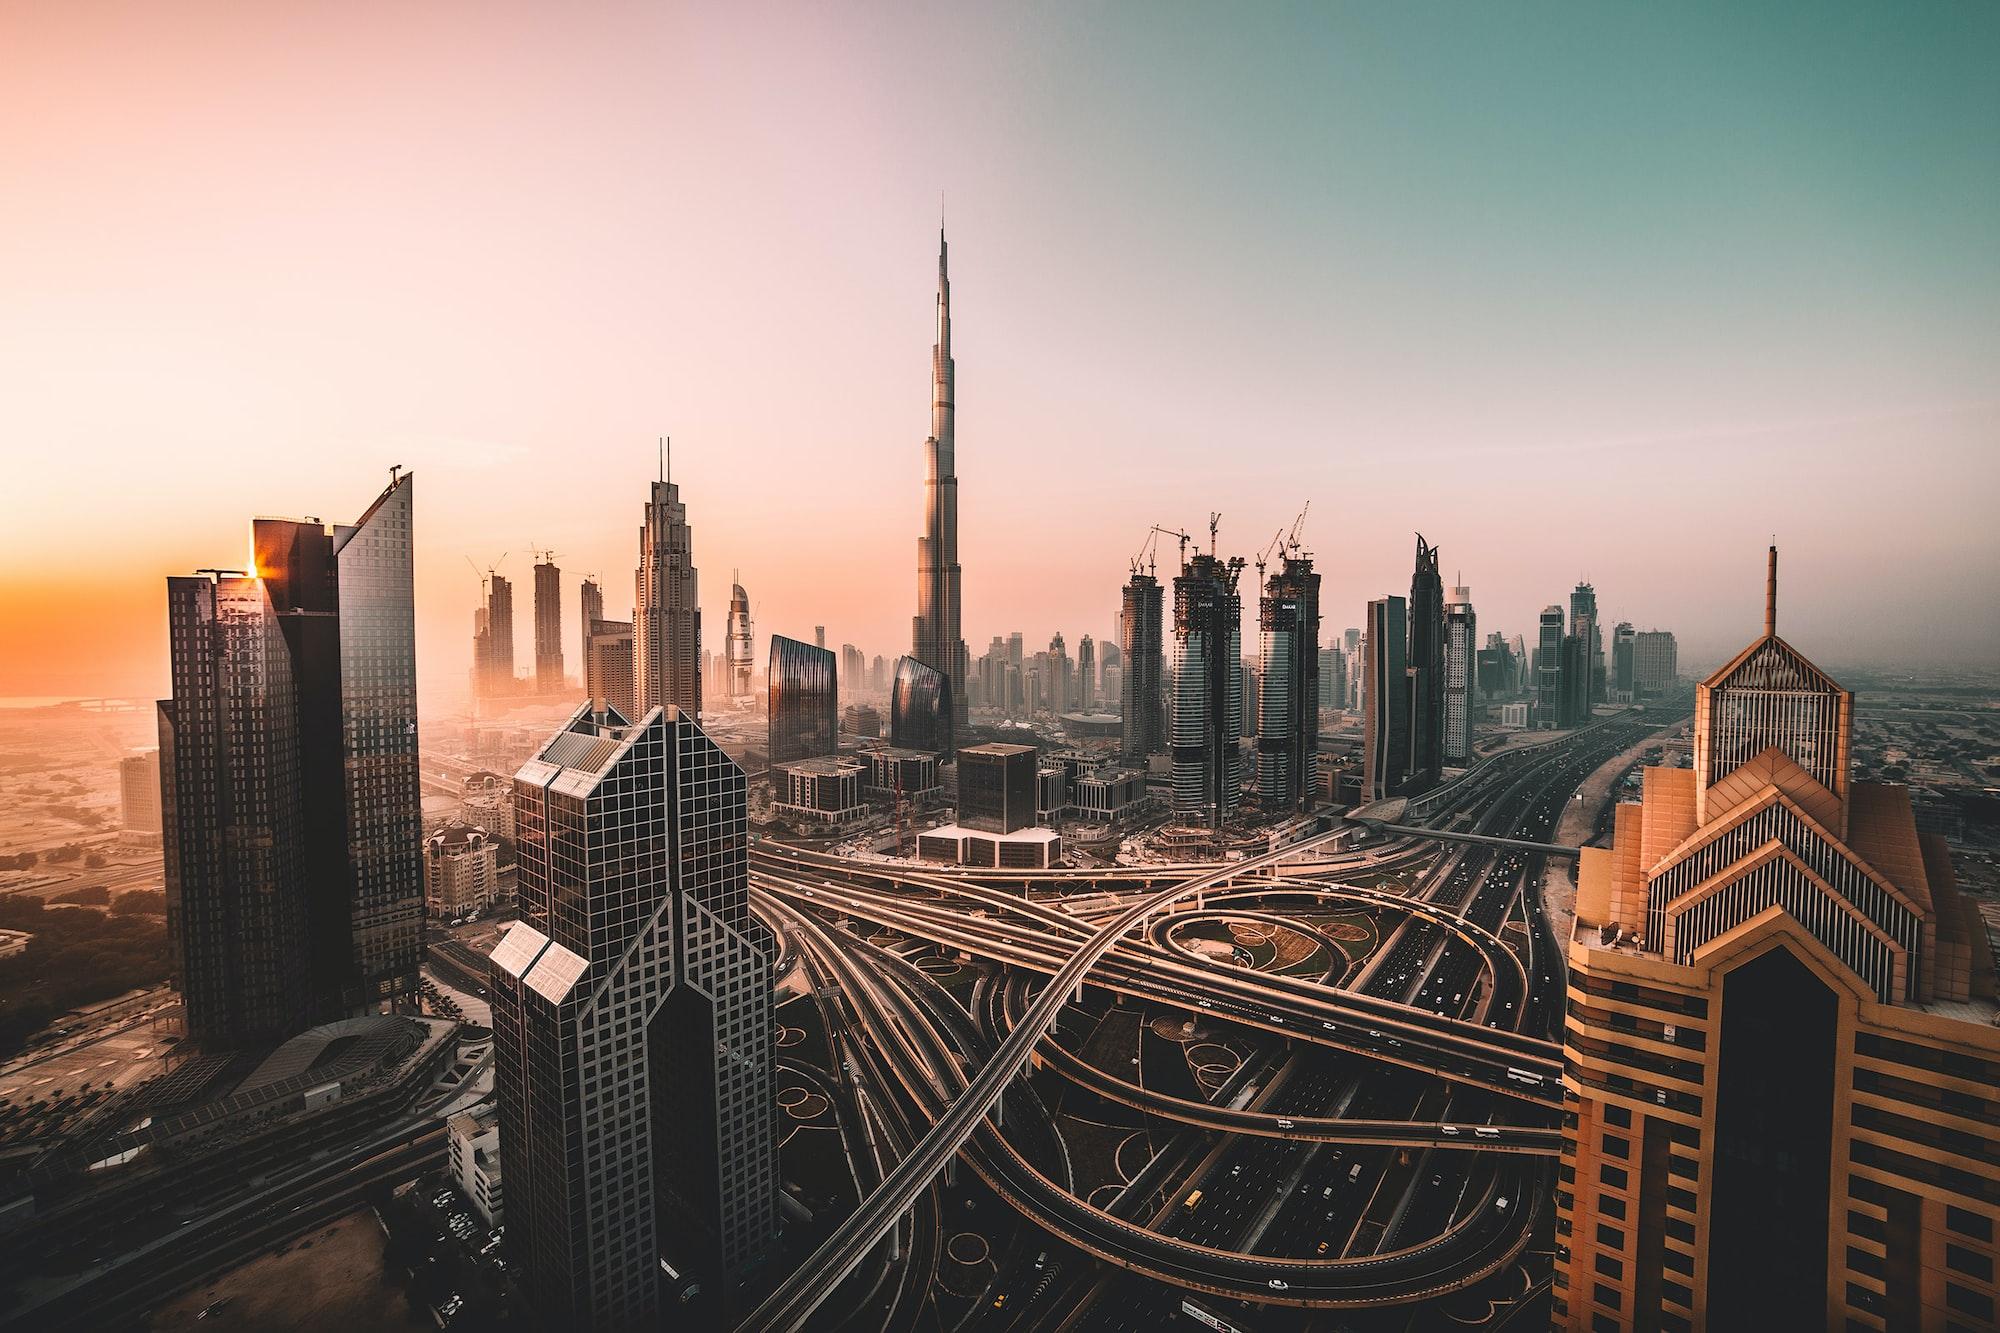 Sunrise shot of Downtown Dubai and Burj Khalifa.